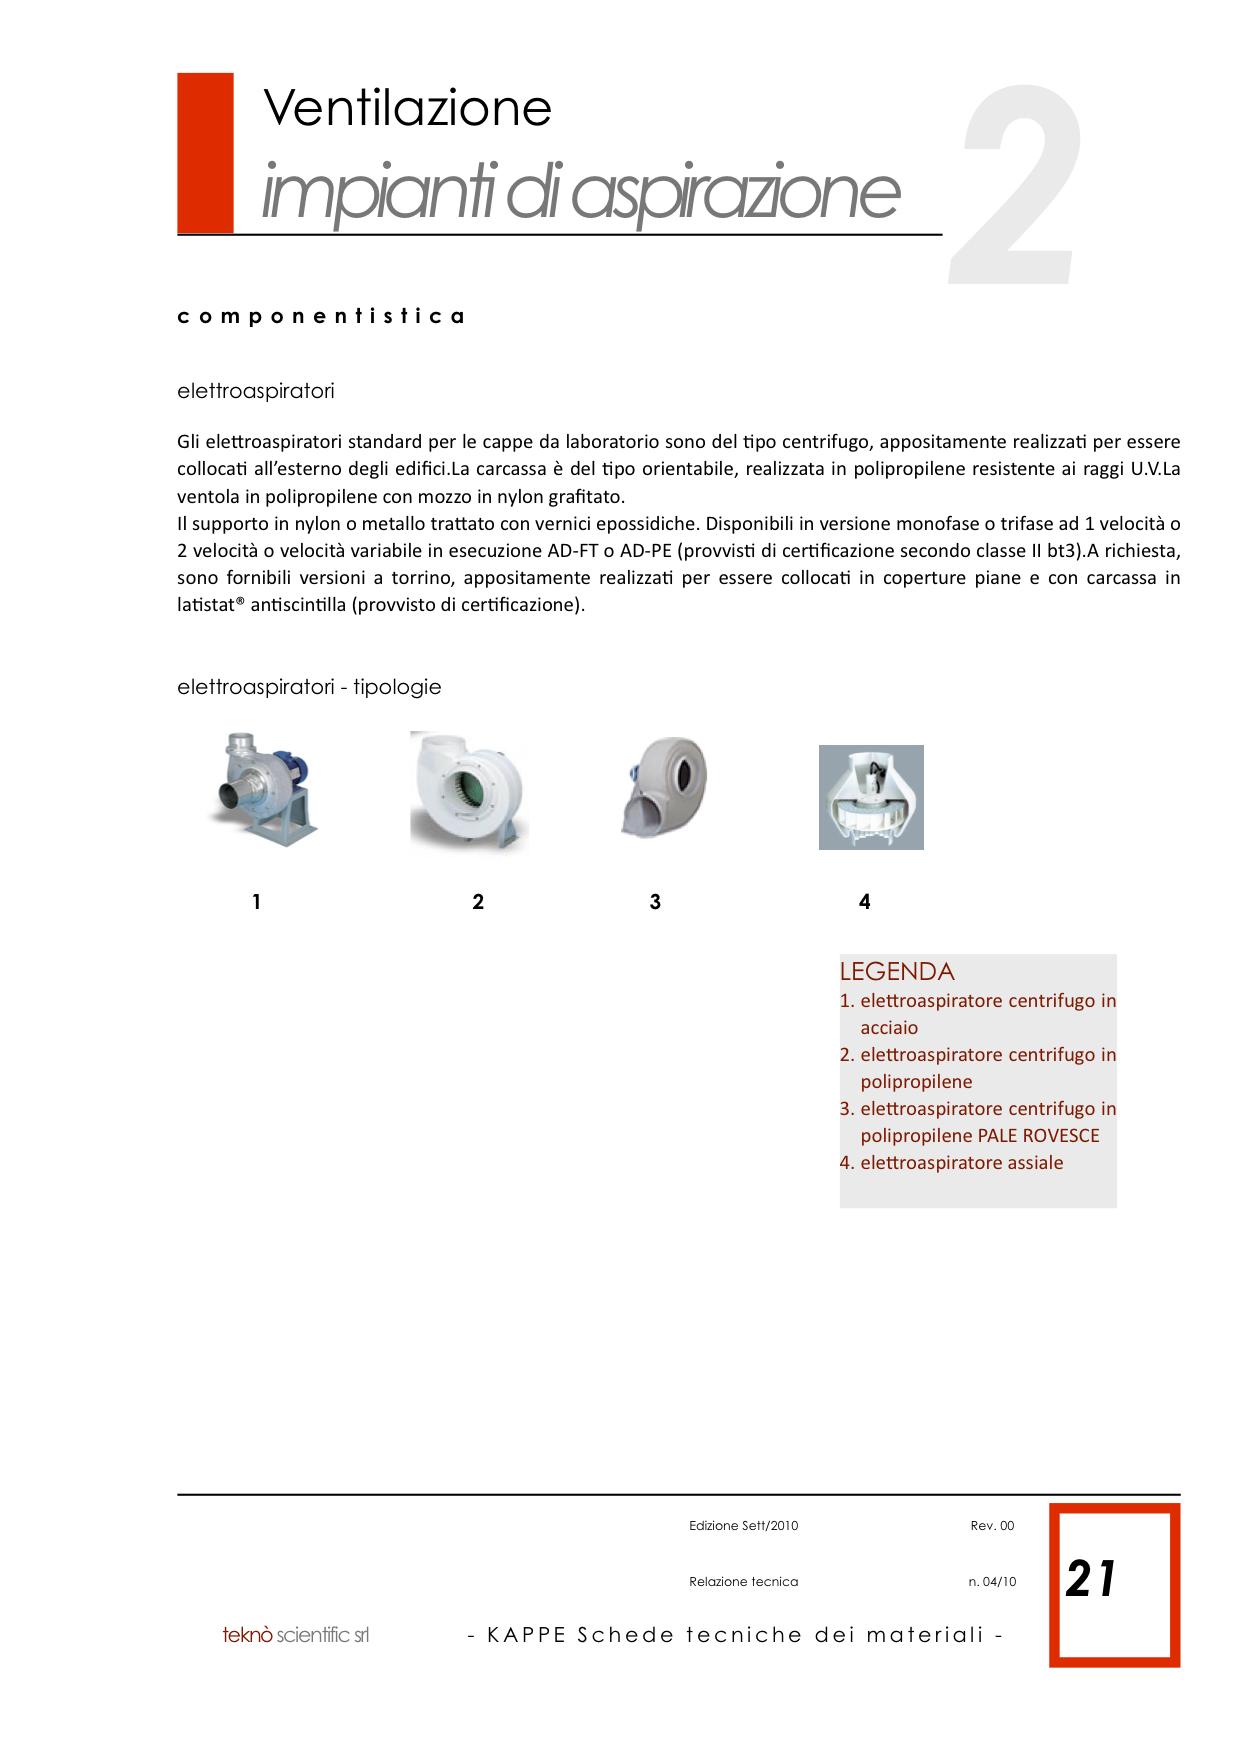 KAPPE Schede tecniche materiali.png